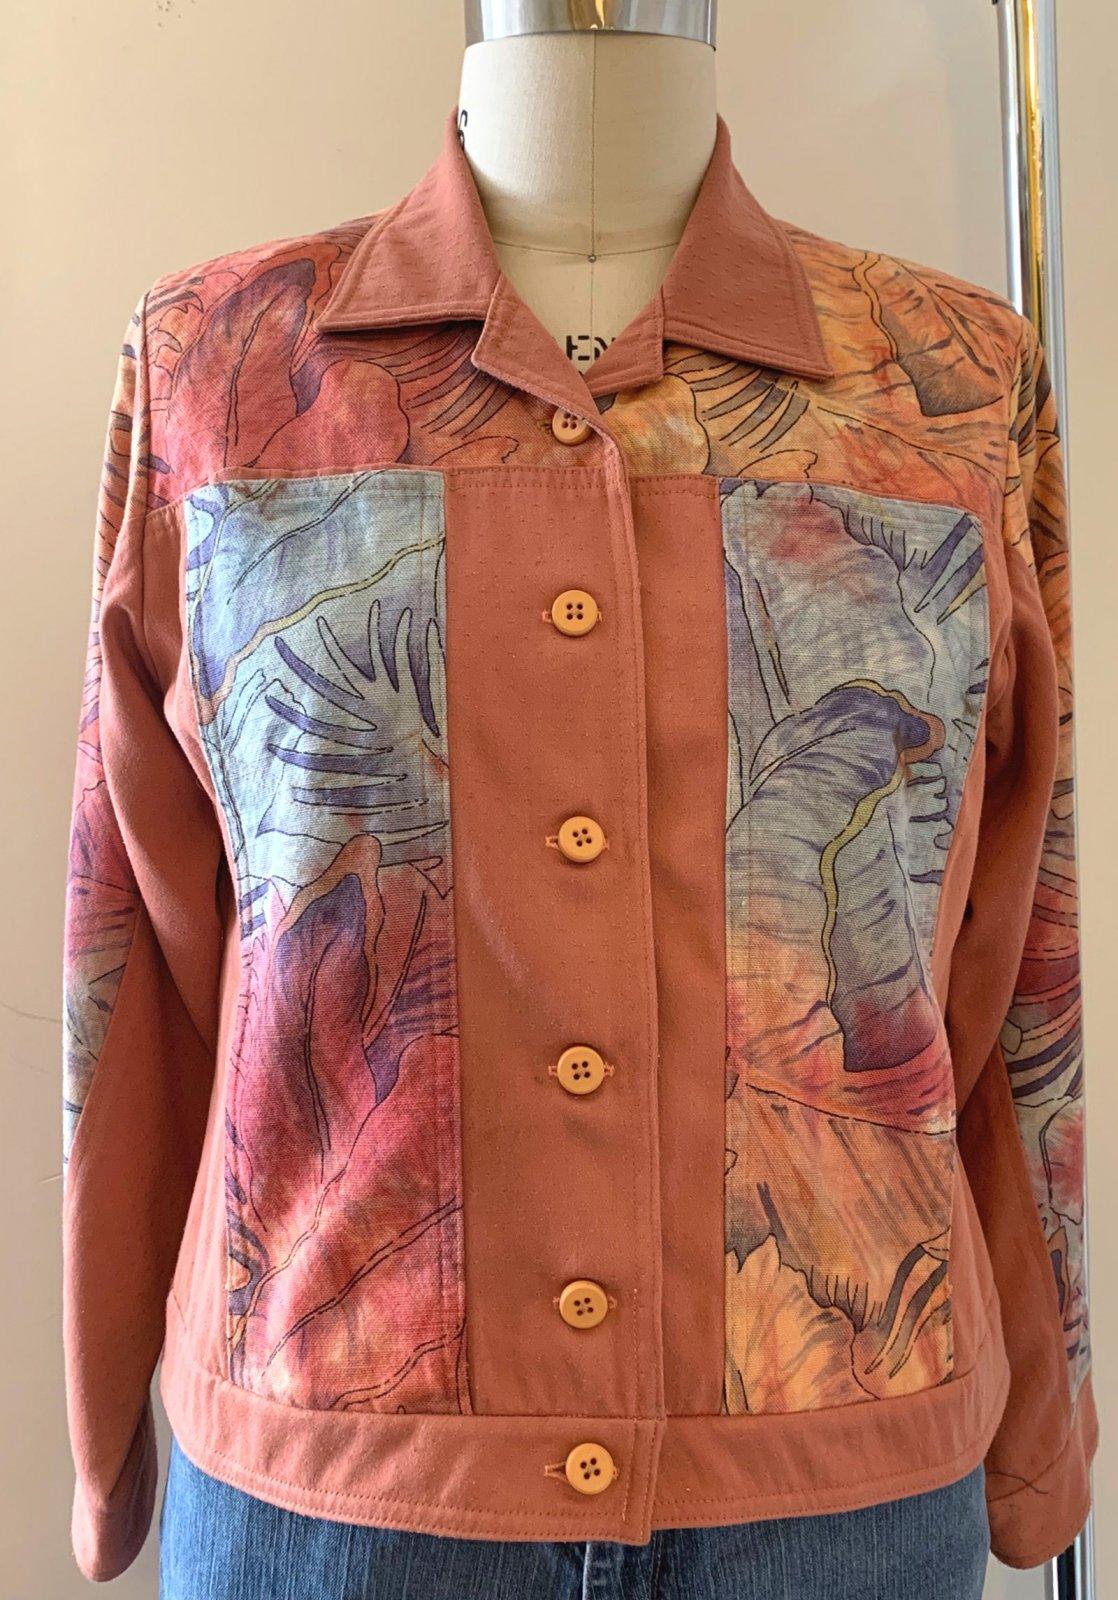 Jambalaya Jacket with Hand Dyed Fabric